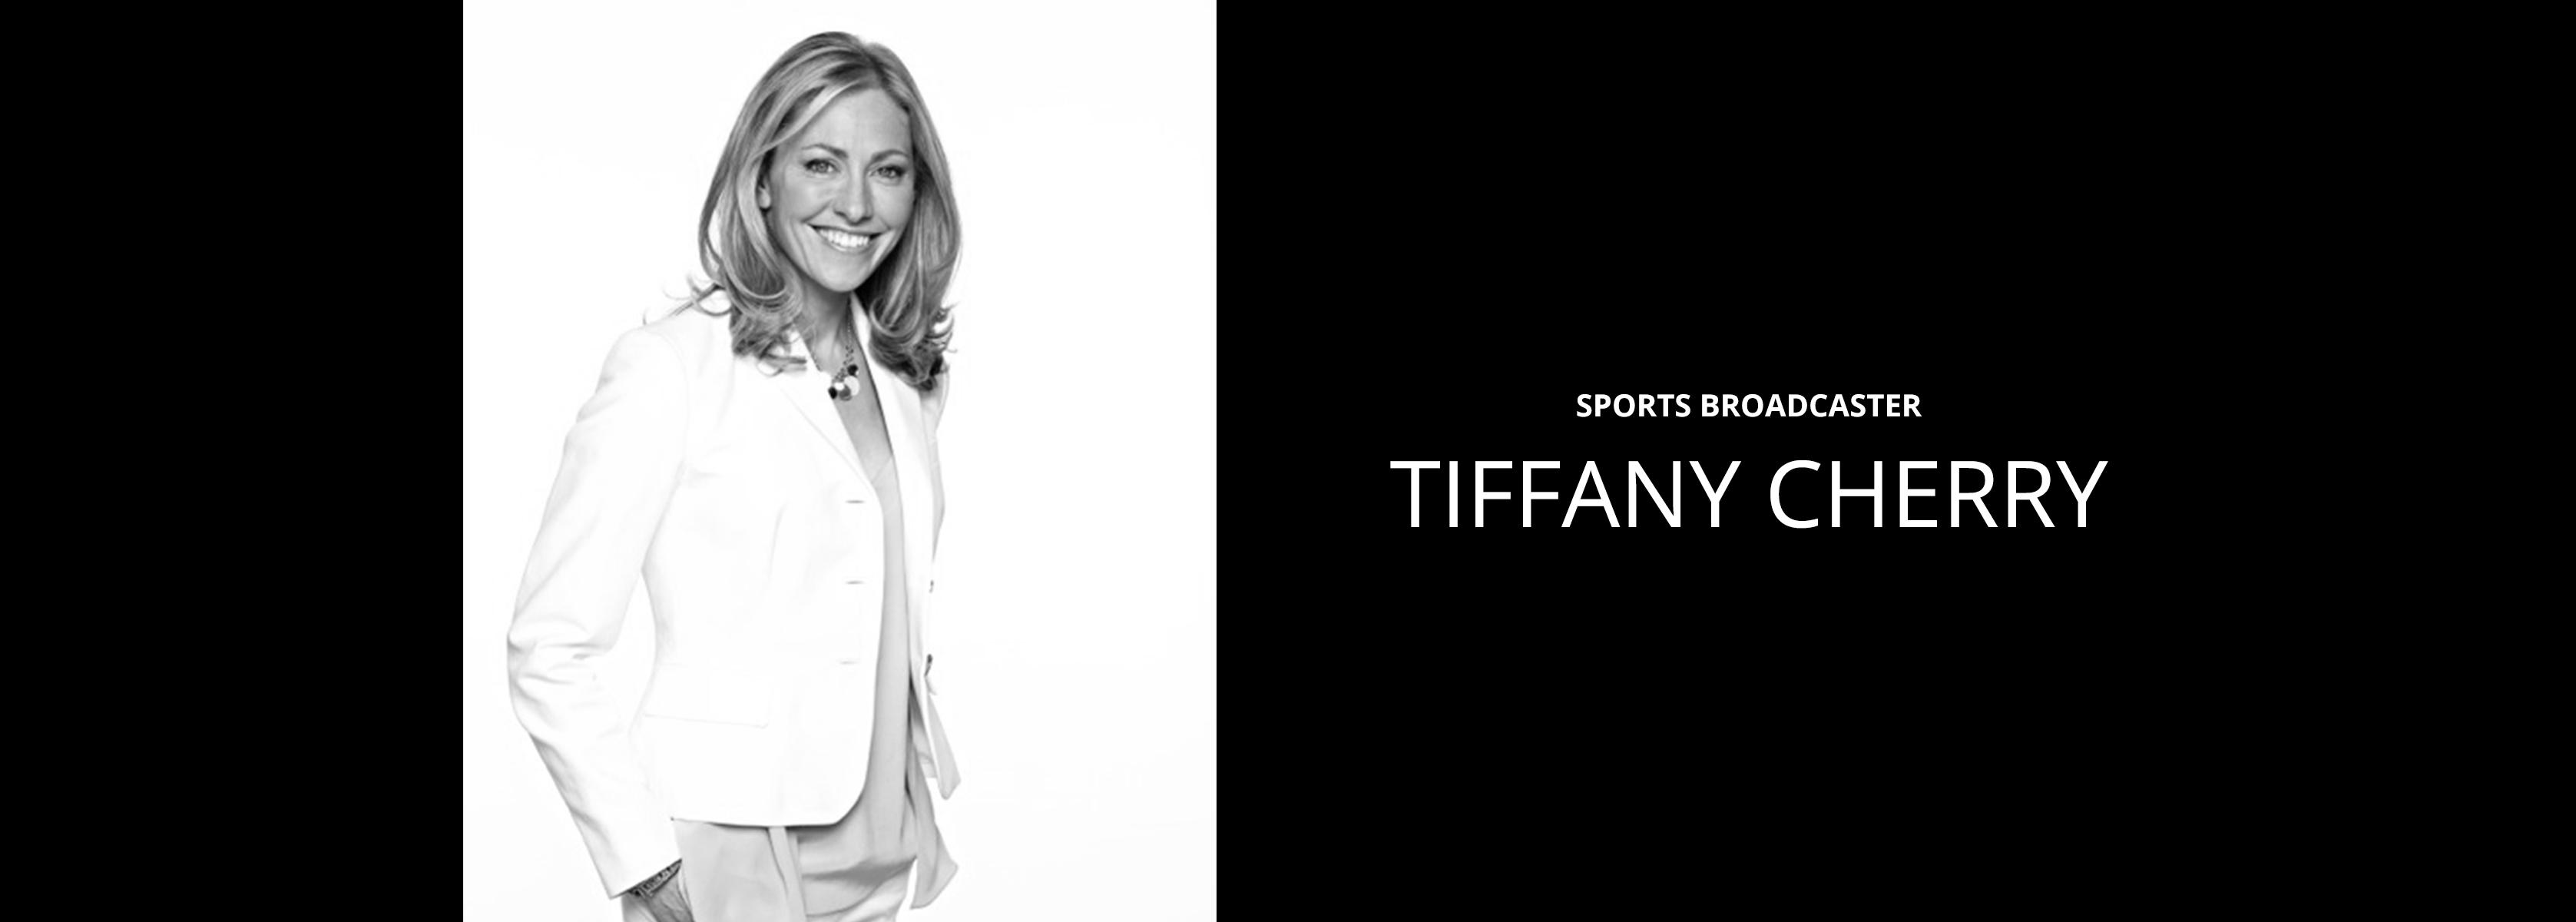 Tiffany Cherry - Sports Broadcaster - Bravo Talent Management